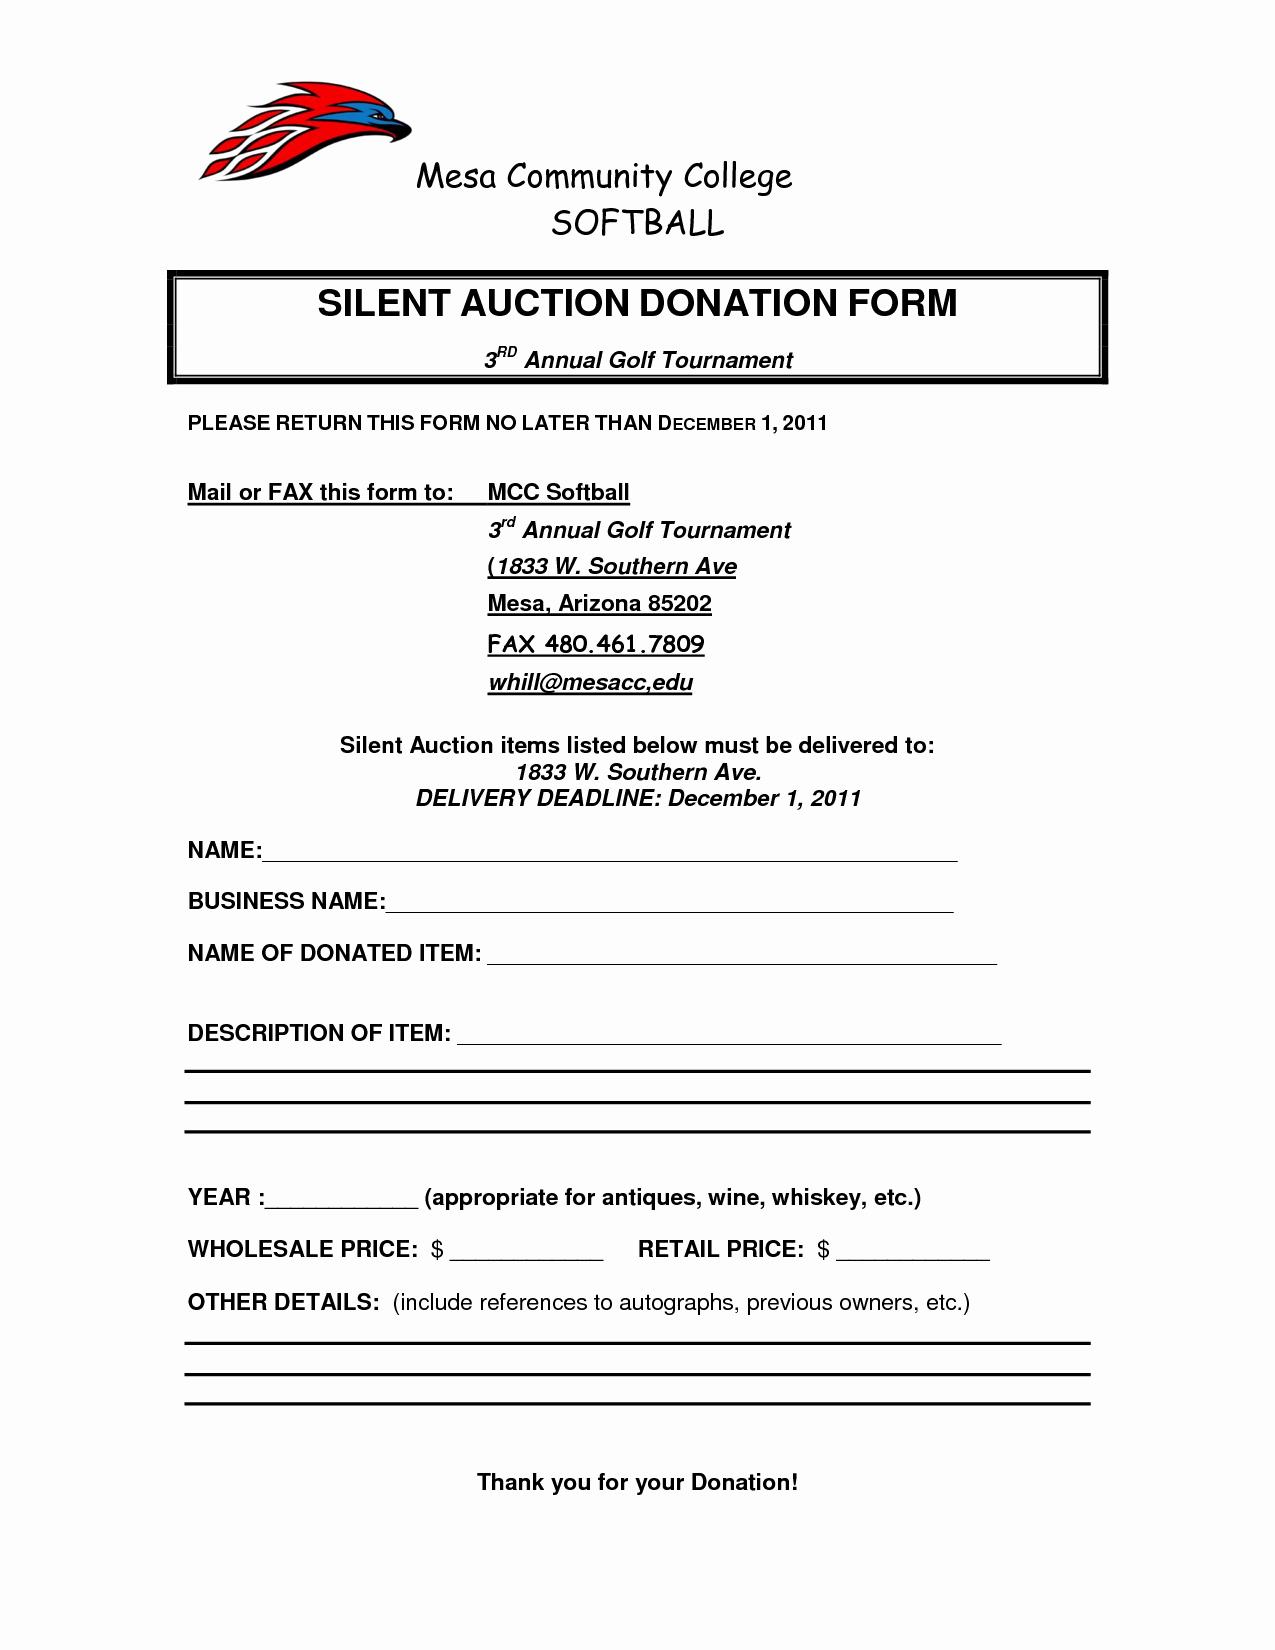 Silent Auction Donation Letter Template Beautiful Silent Auction Donation Request form by Ttn